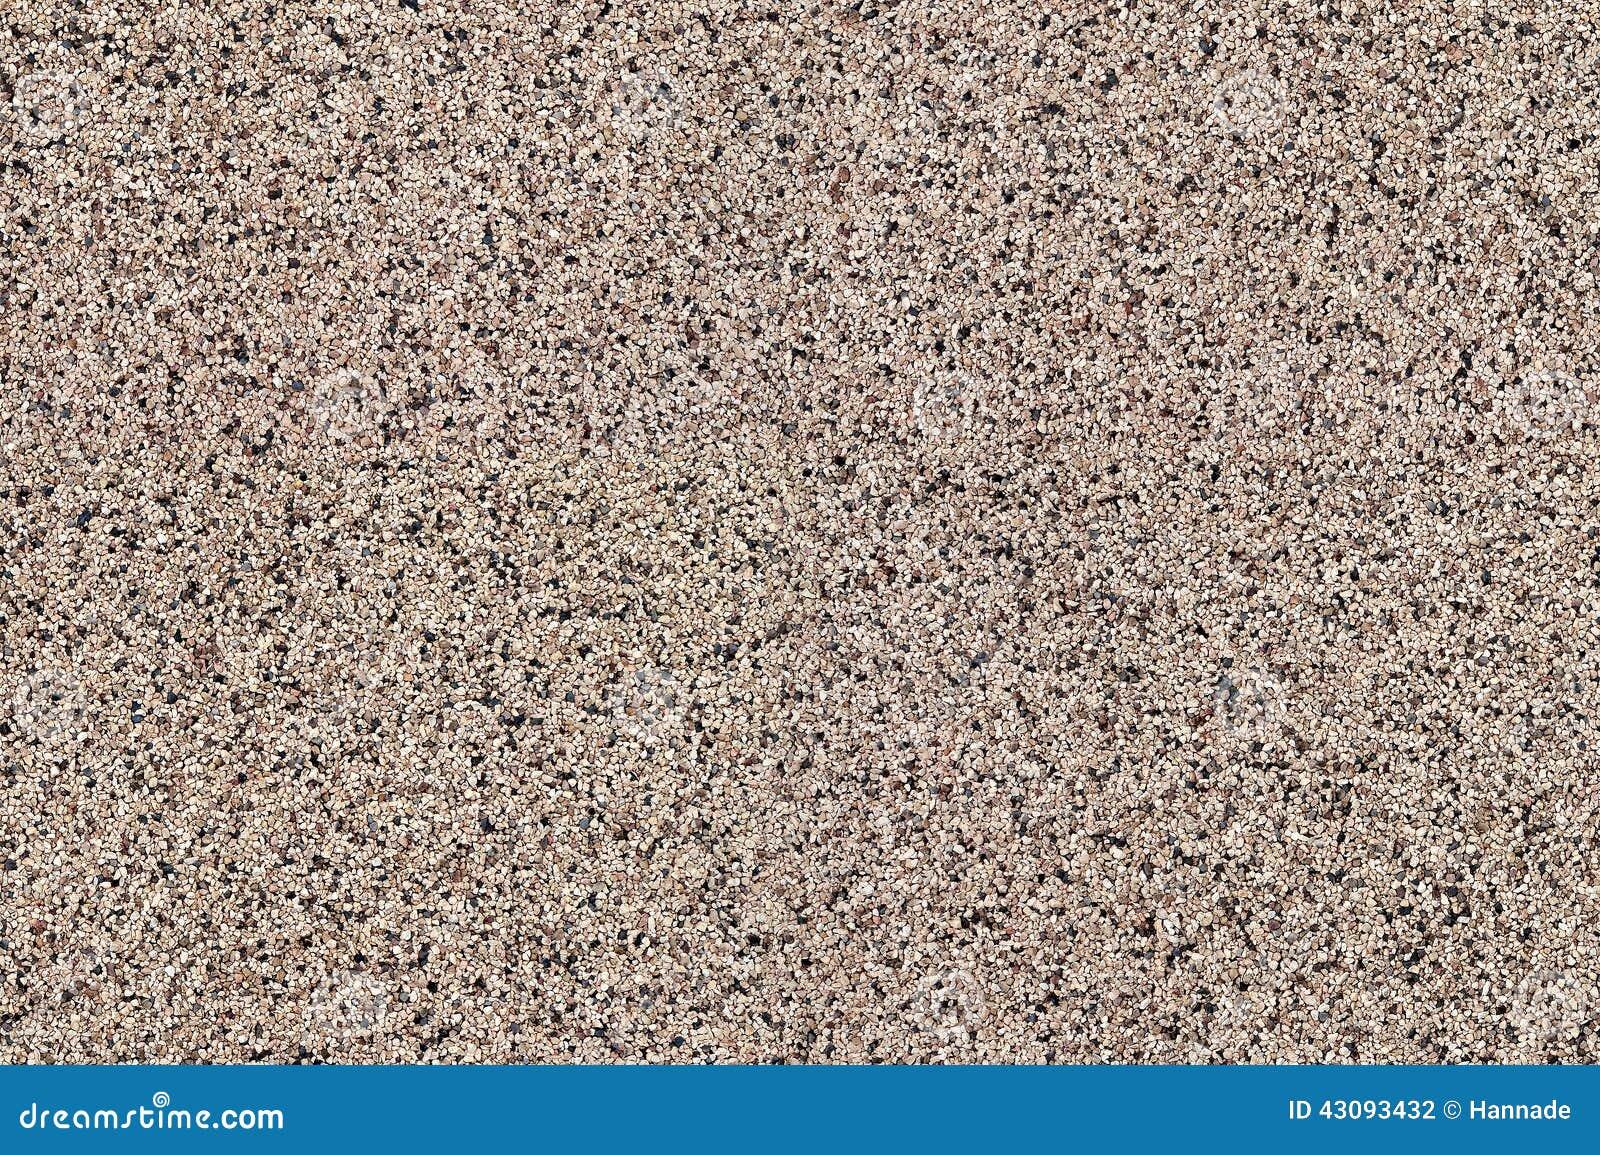 Pebbles-Seamless texture